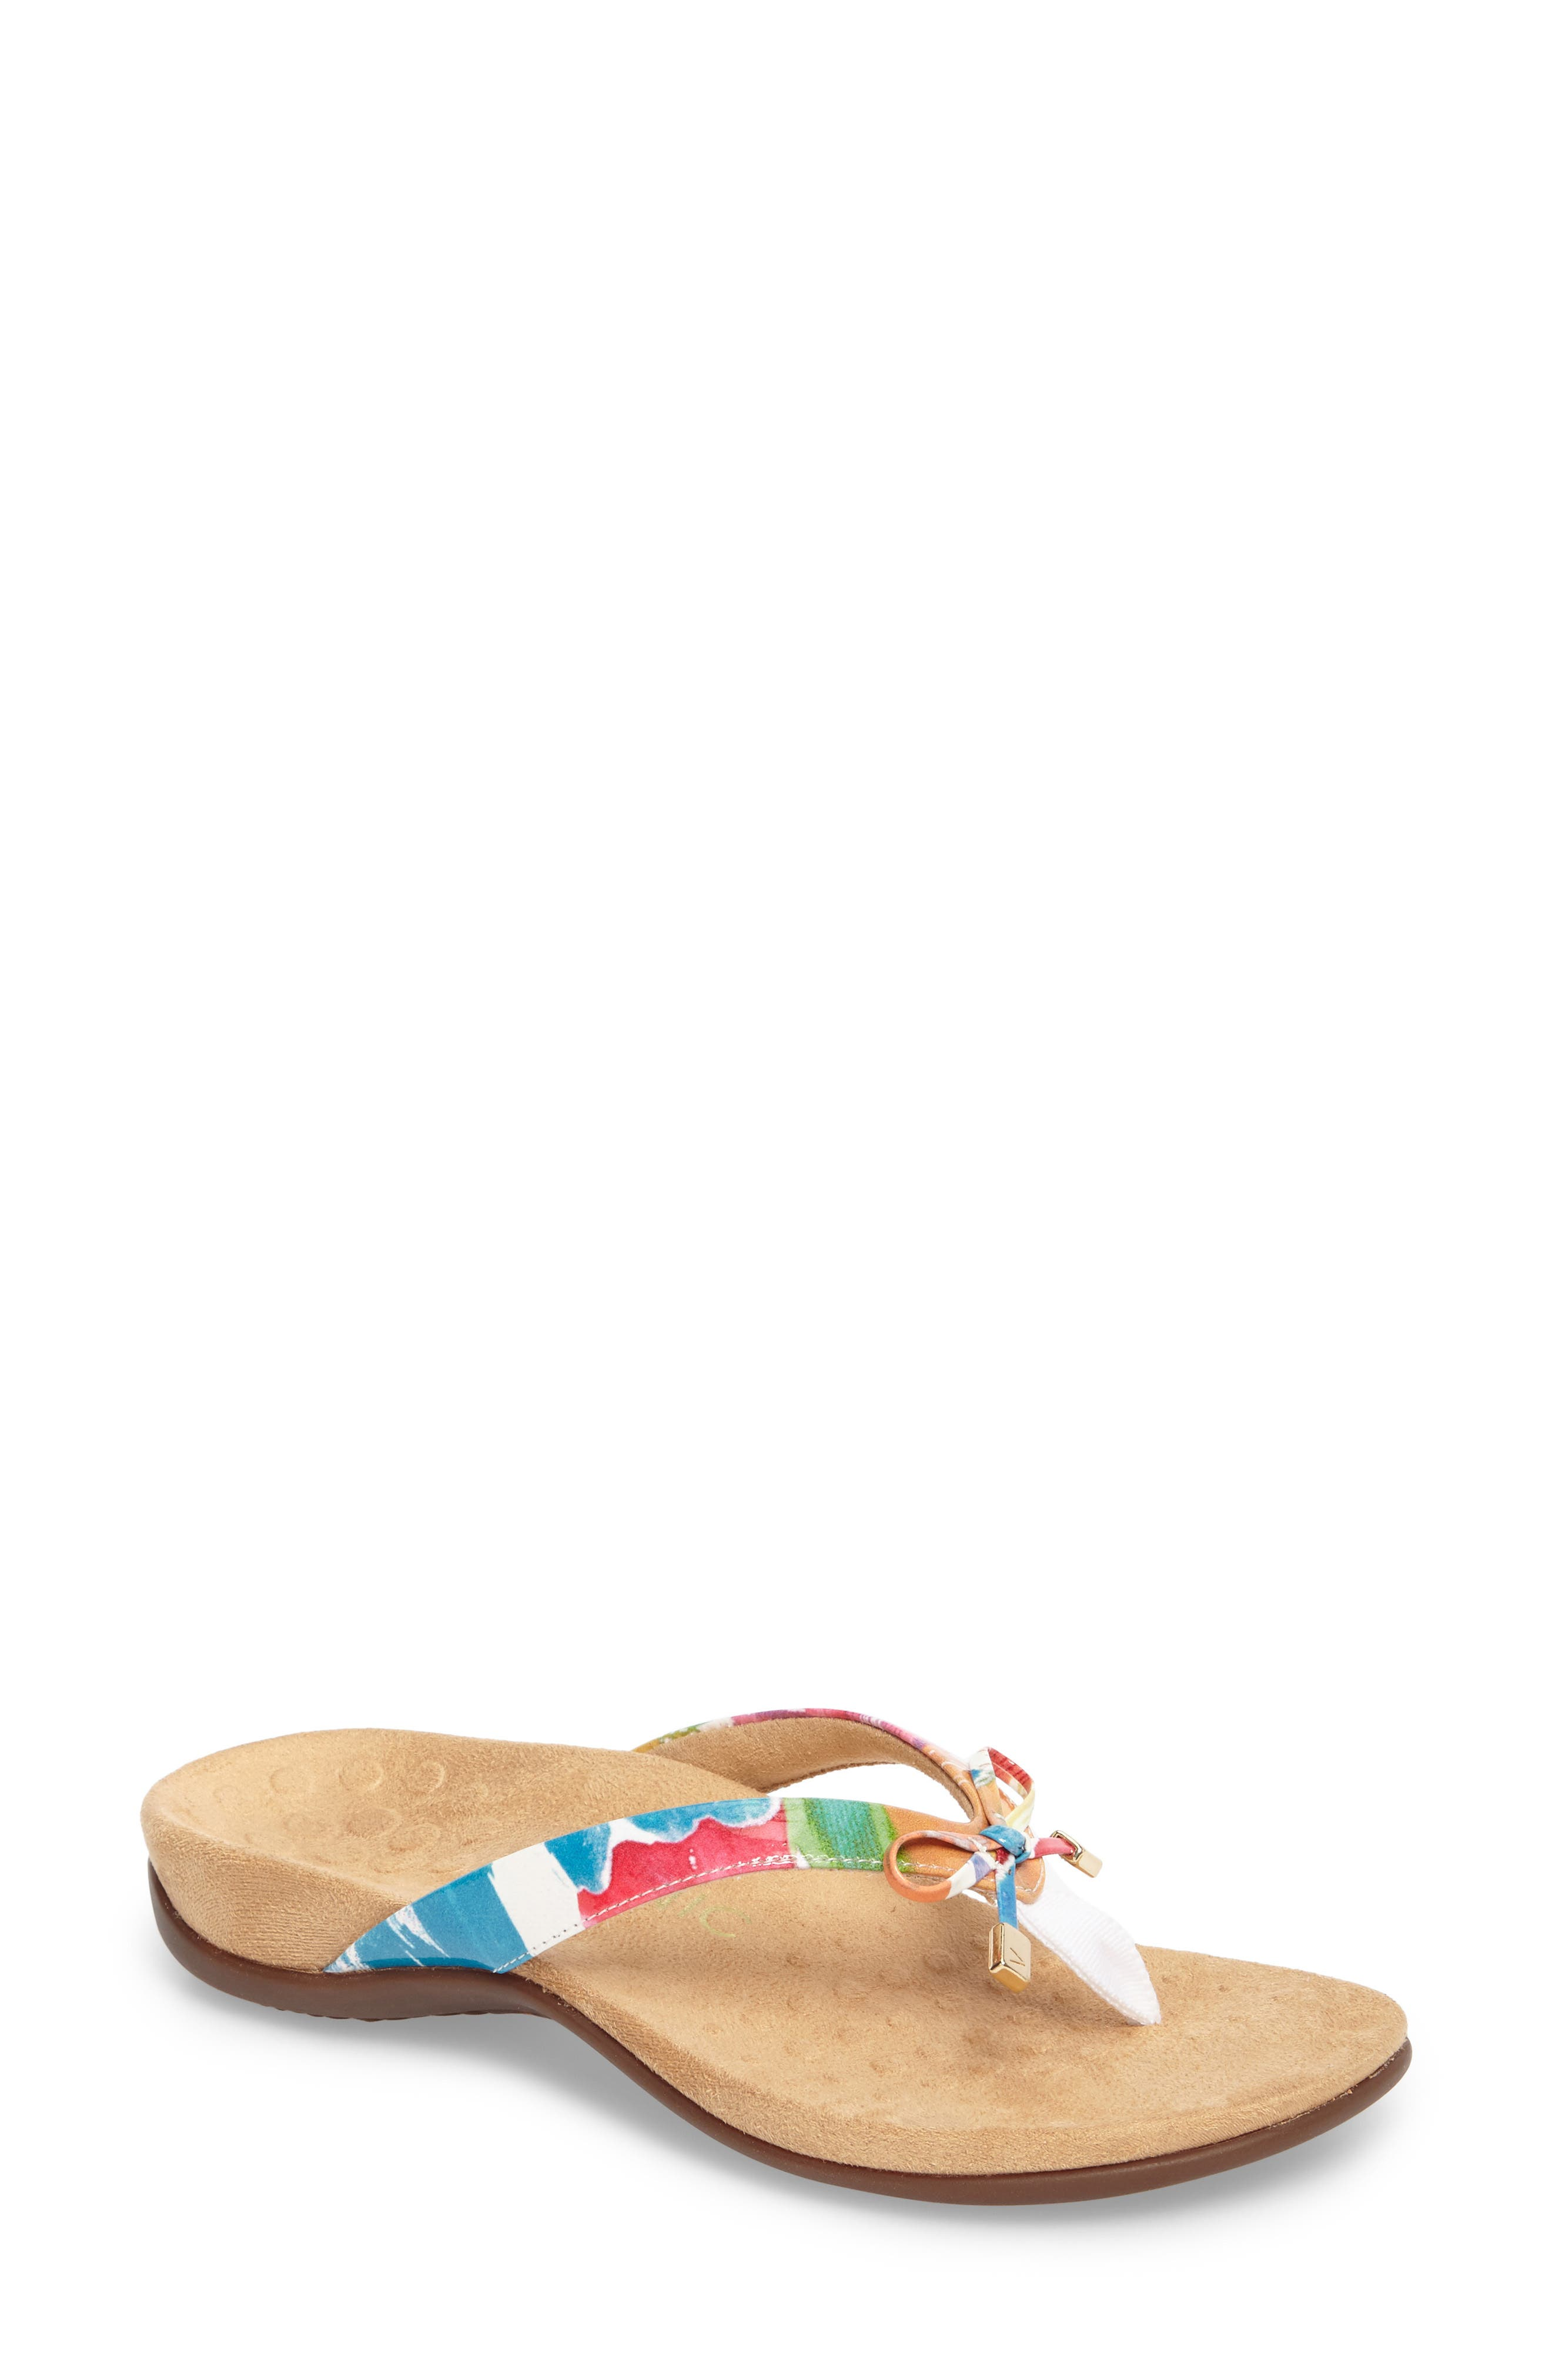 'Bella II' Sandal,                         Main,                         color, WHITE FLORAL FAUX LEATHER